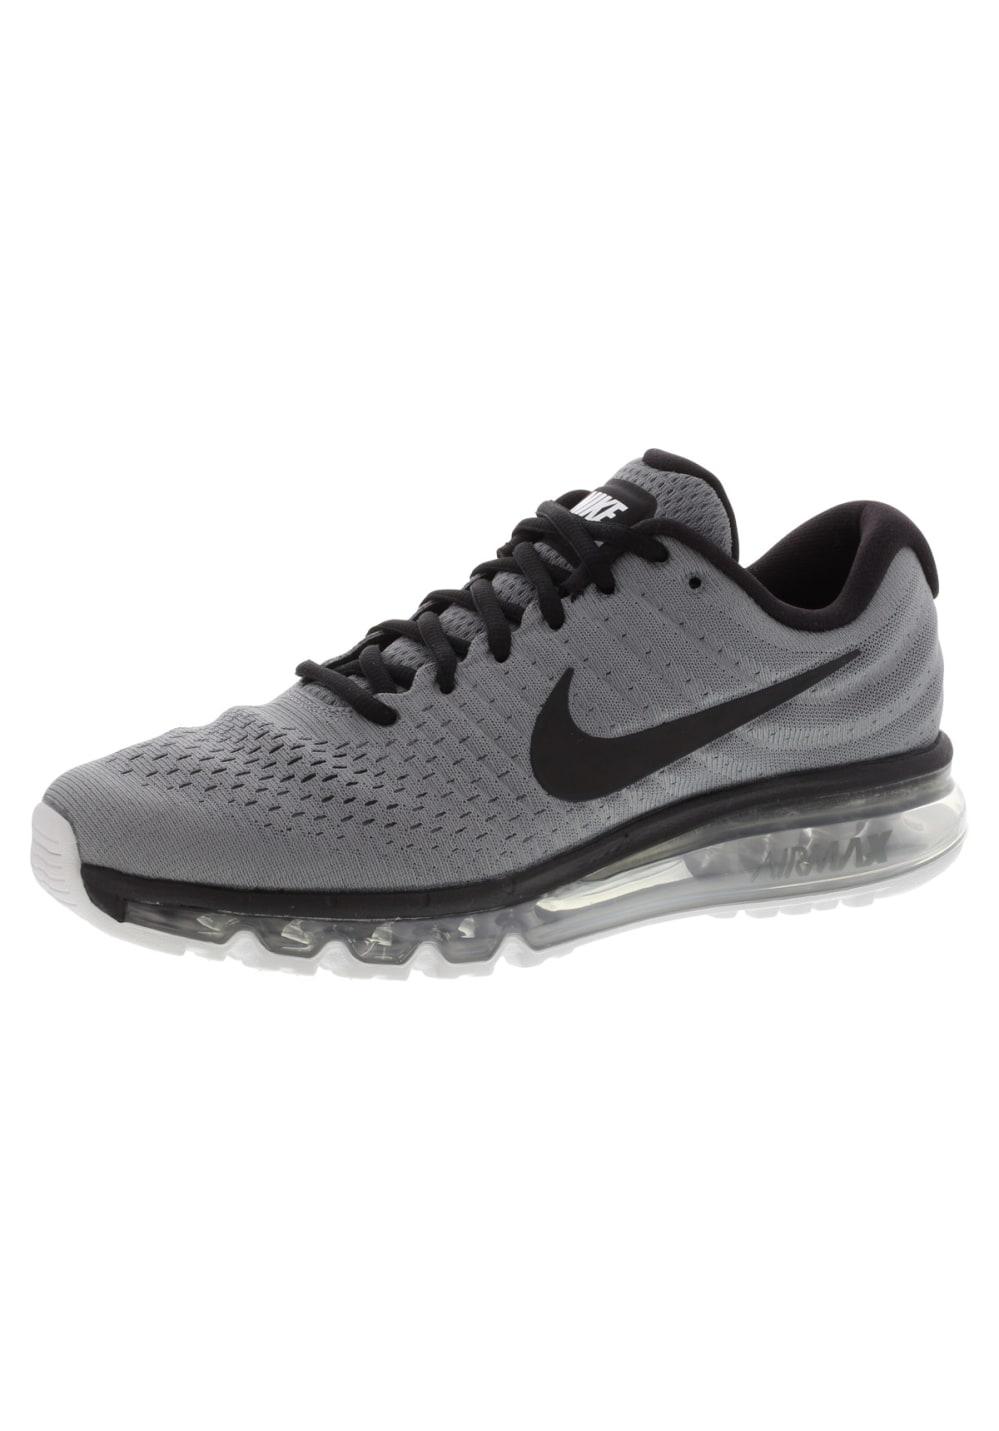 site réputé 22983 c2b60 Nike Air Max 2017 - Running shoes for Men - Grey